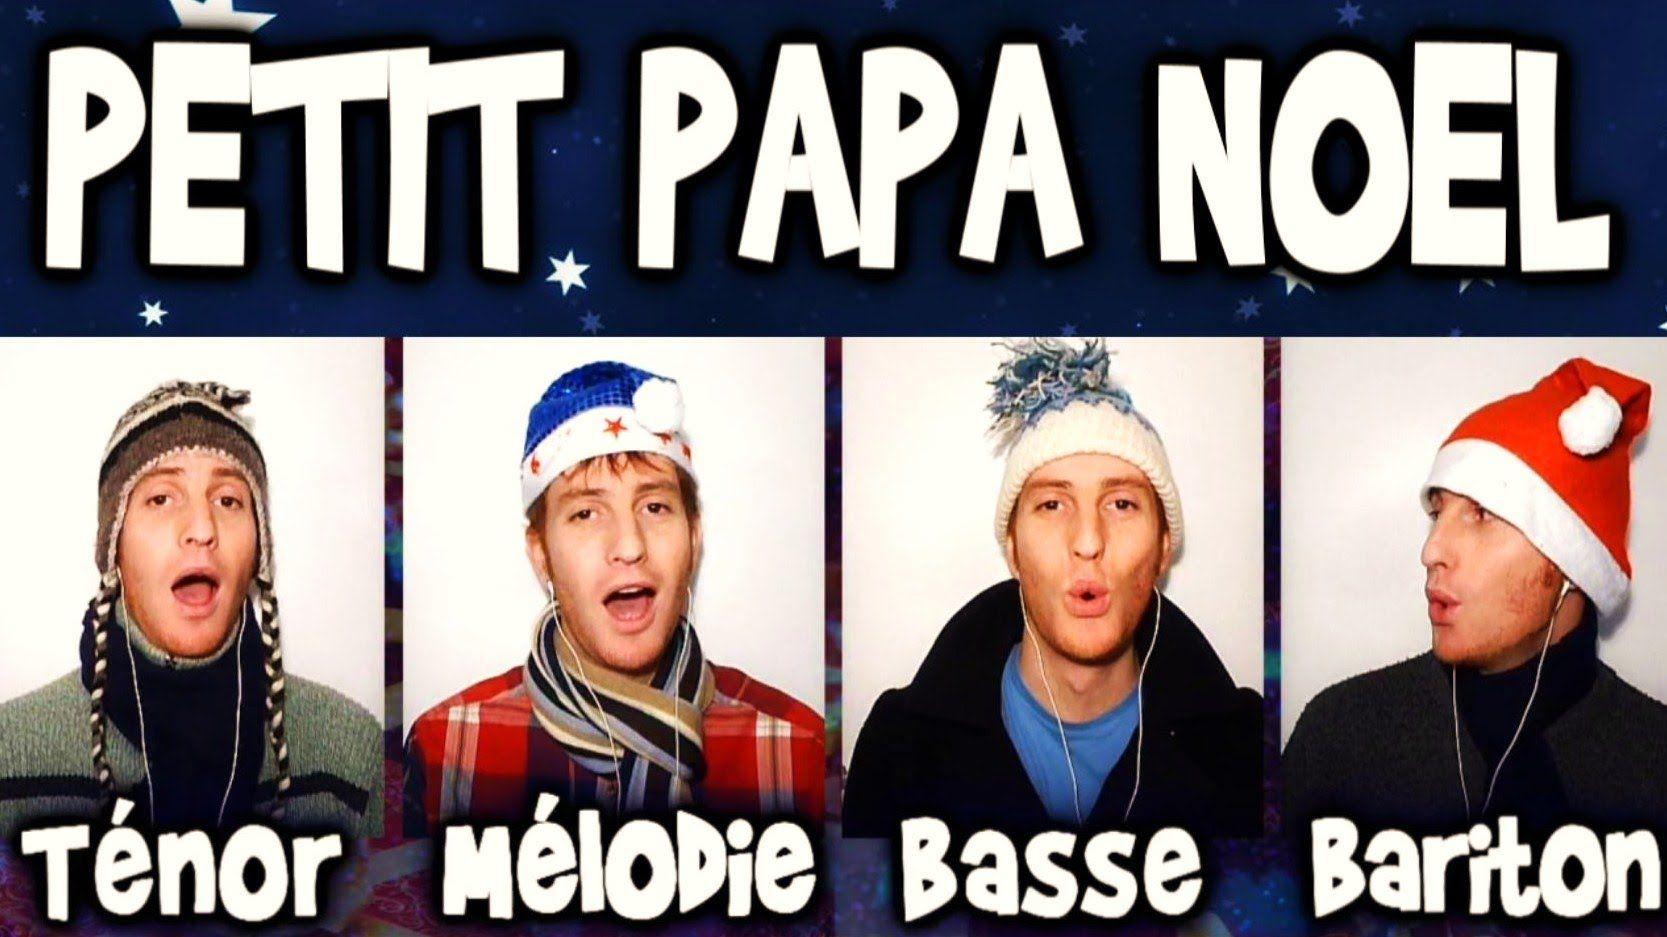 Petit Papa Noel (A Cappella) - Julien Neel | Barbershop | Pinterest ...